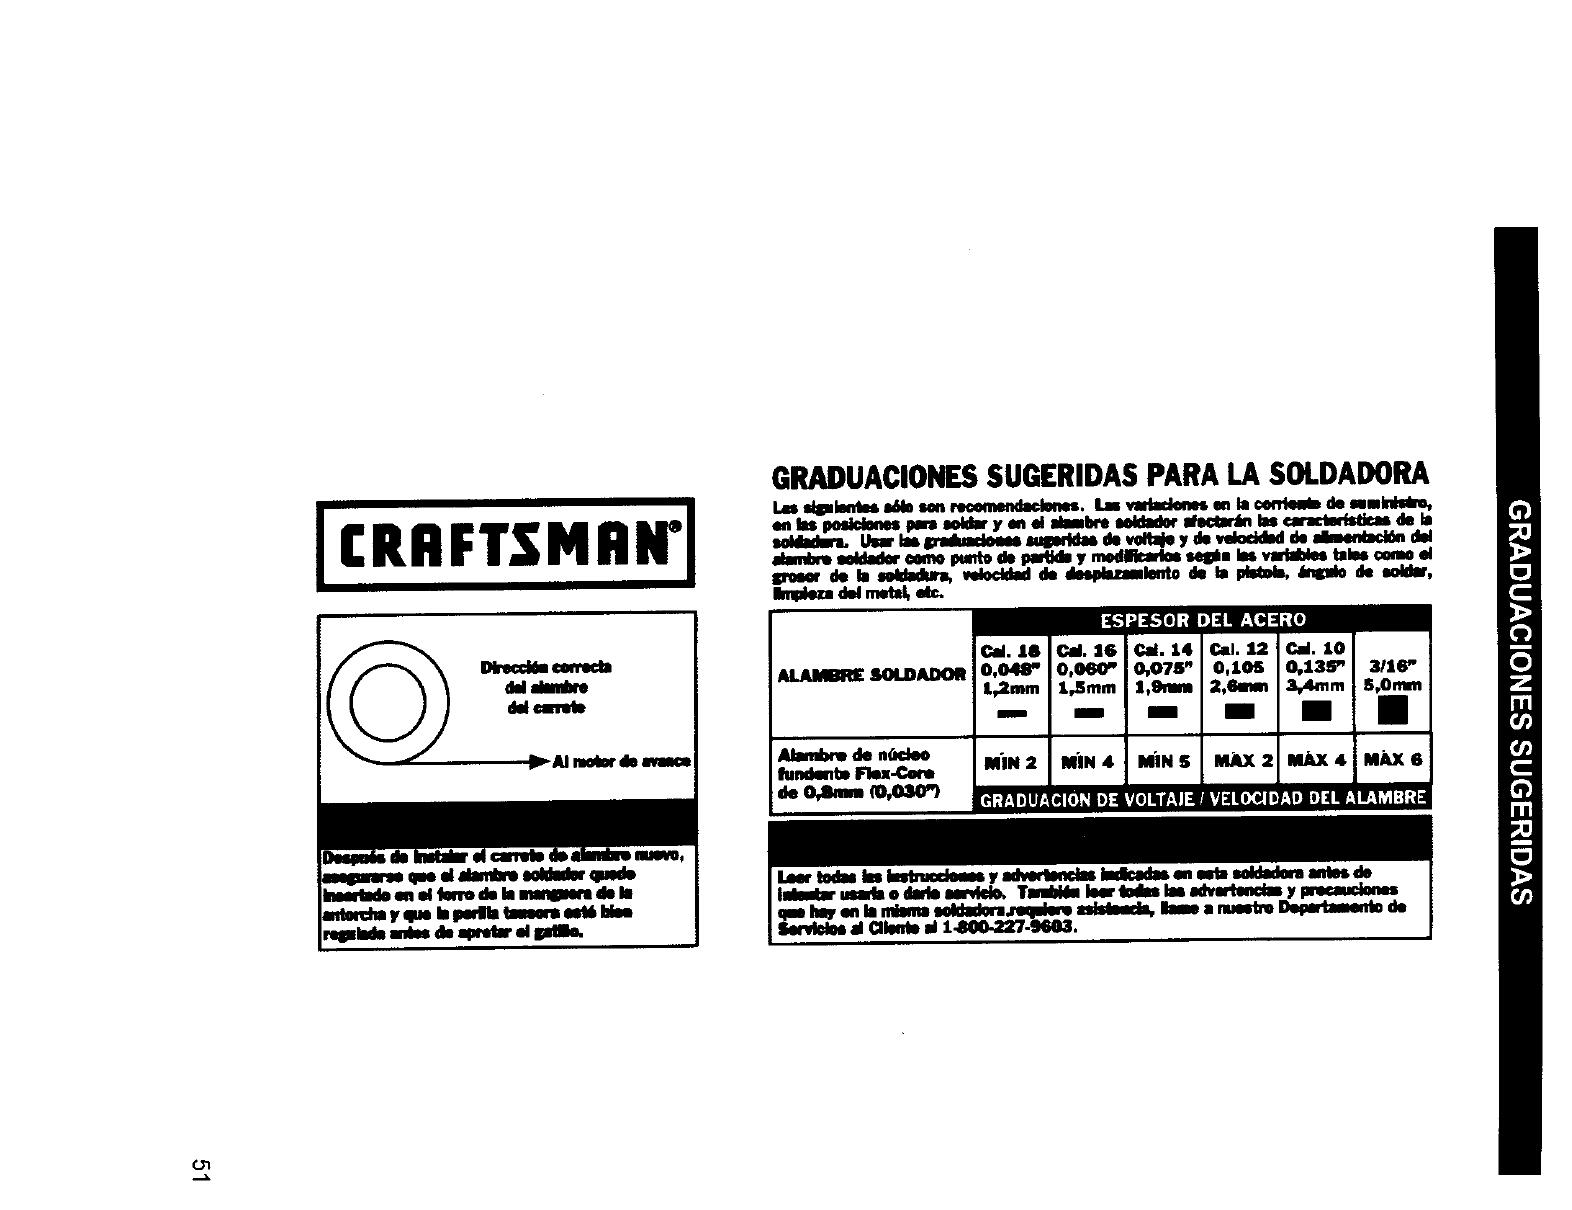 Craftsman 196205680 User Manual MIG WELDER Manuals And